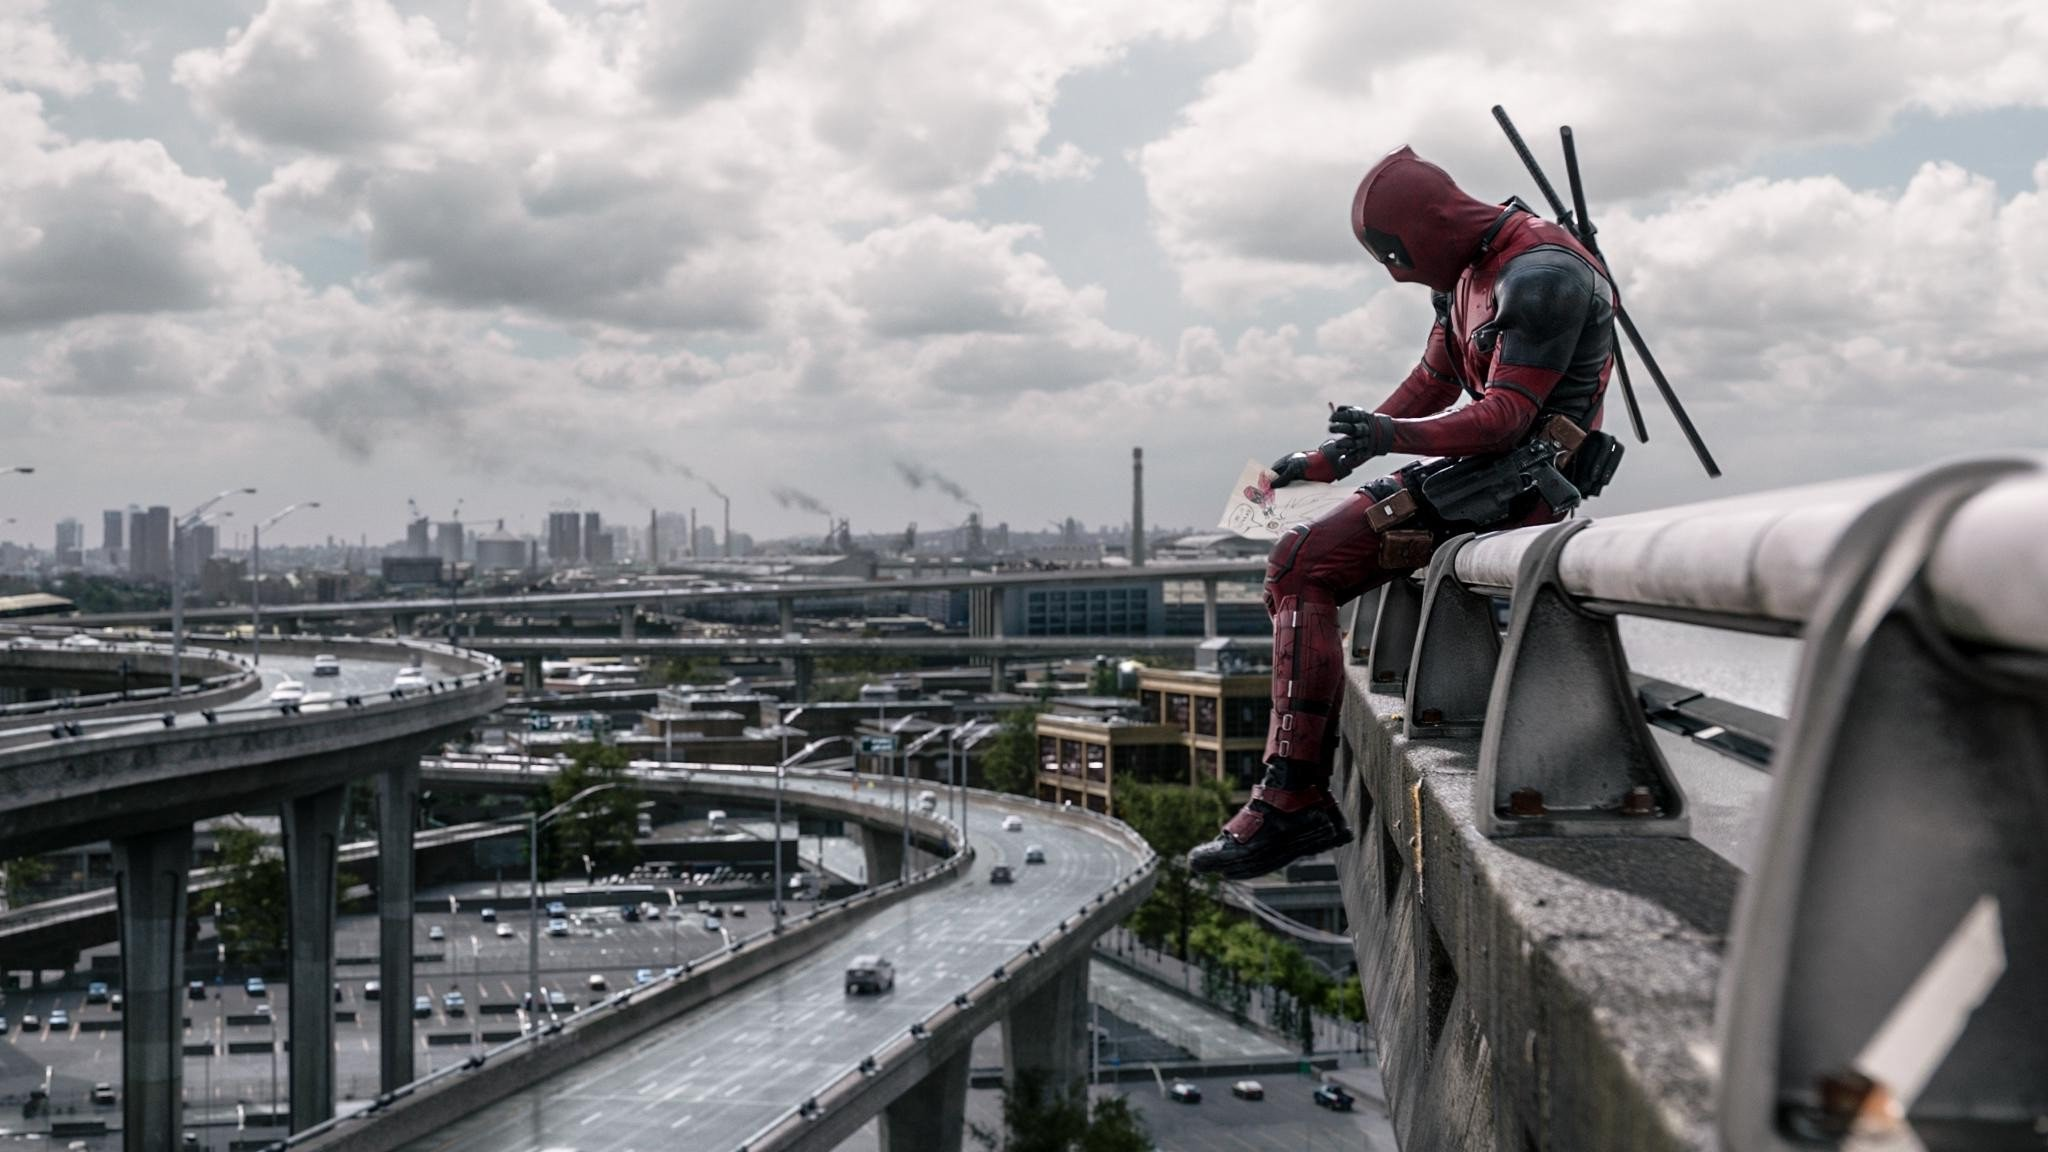 Deadpool Movie Wallpaper 77 Images